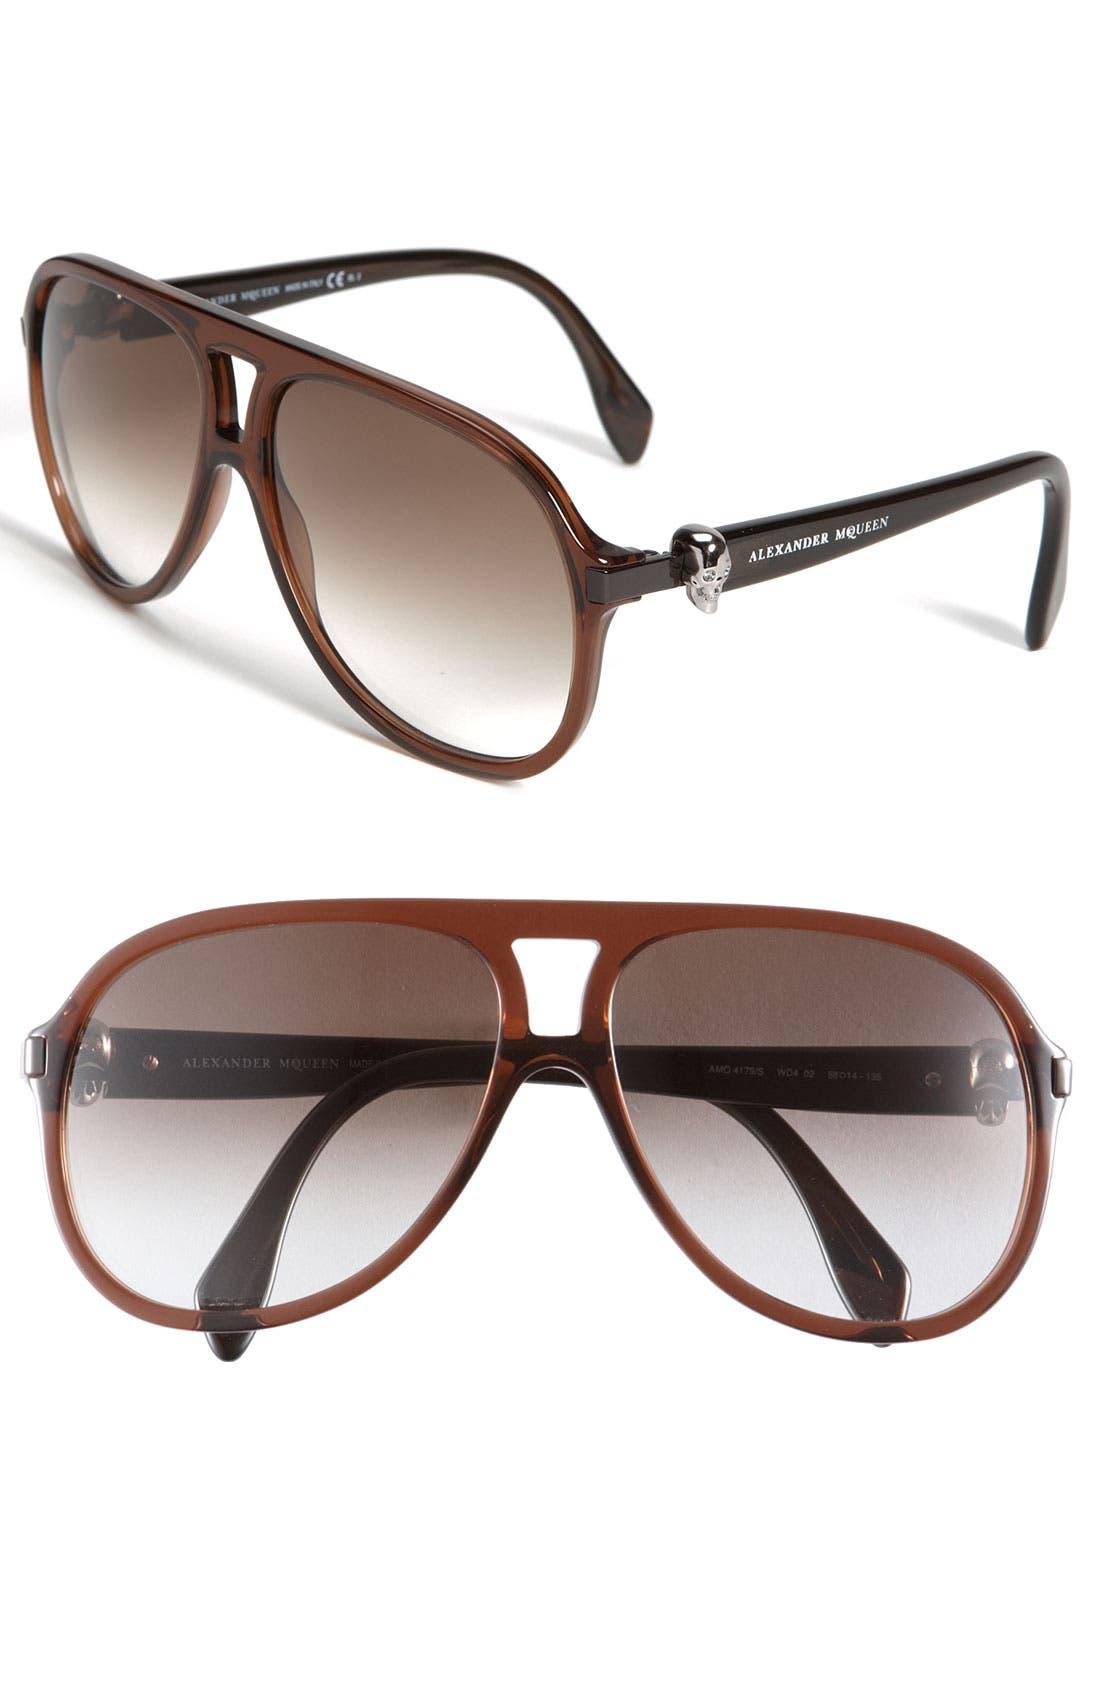 Main Image - Alexander McQueen Aviator Sunglasses